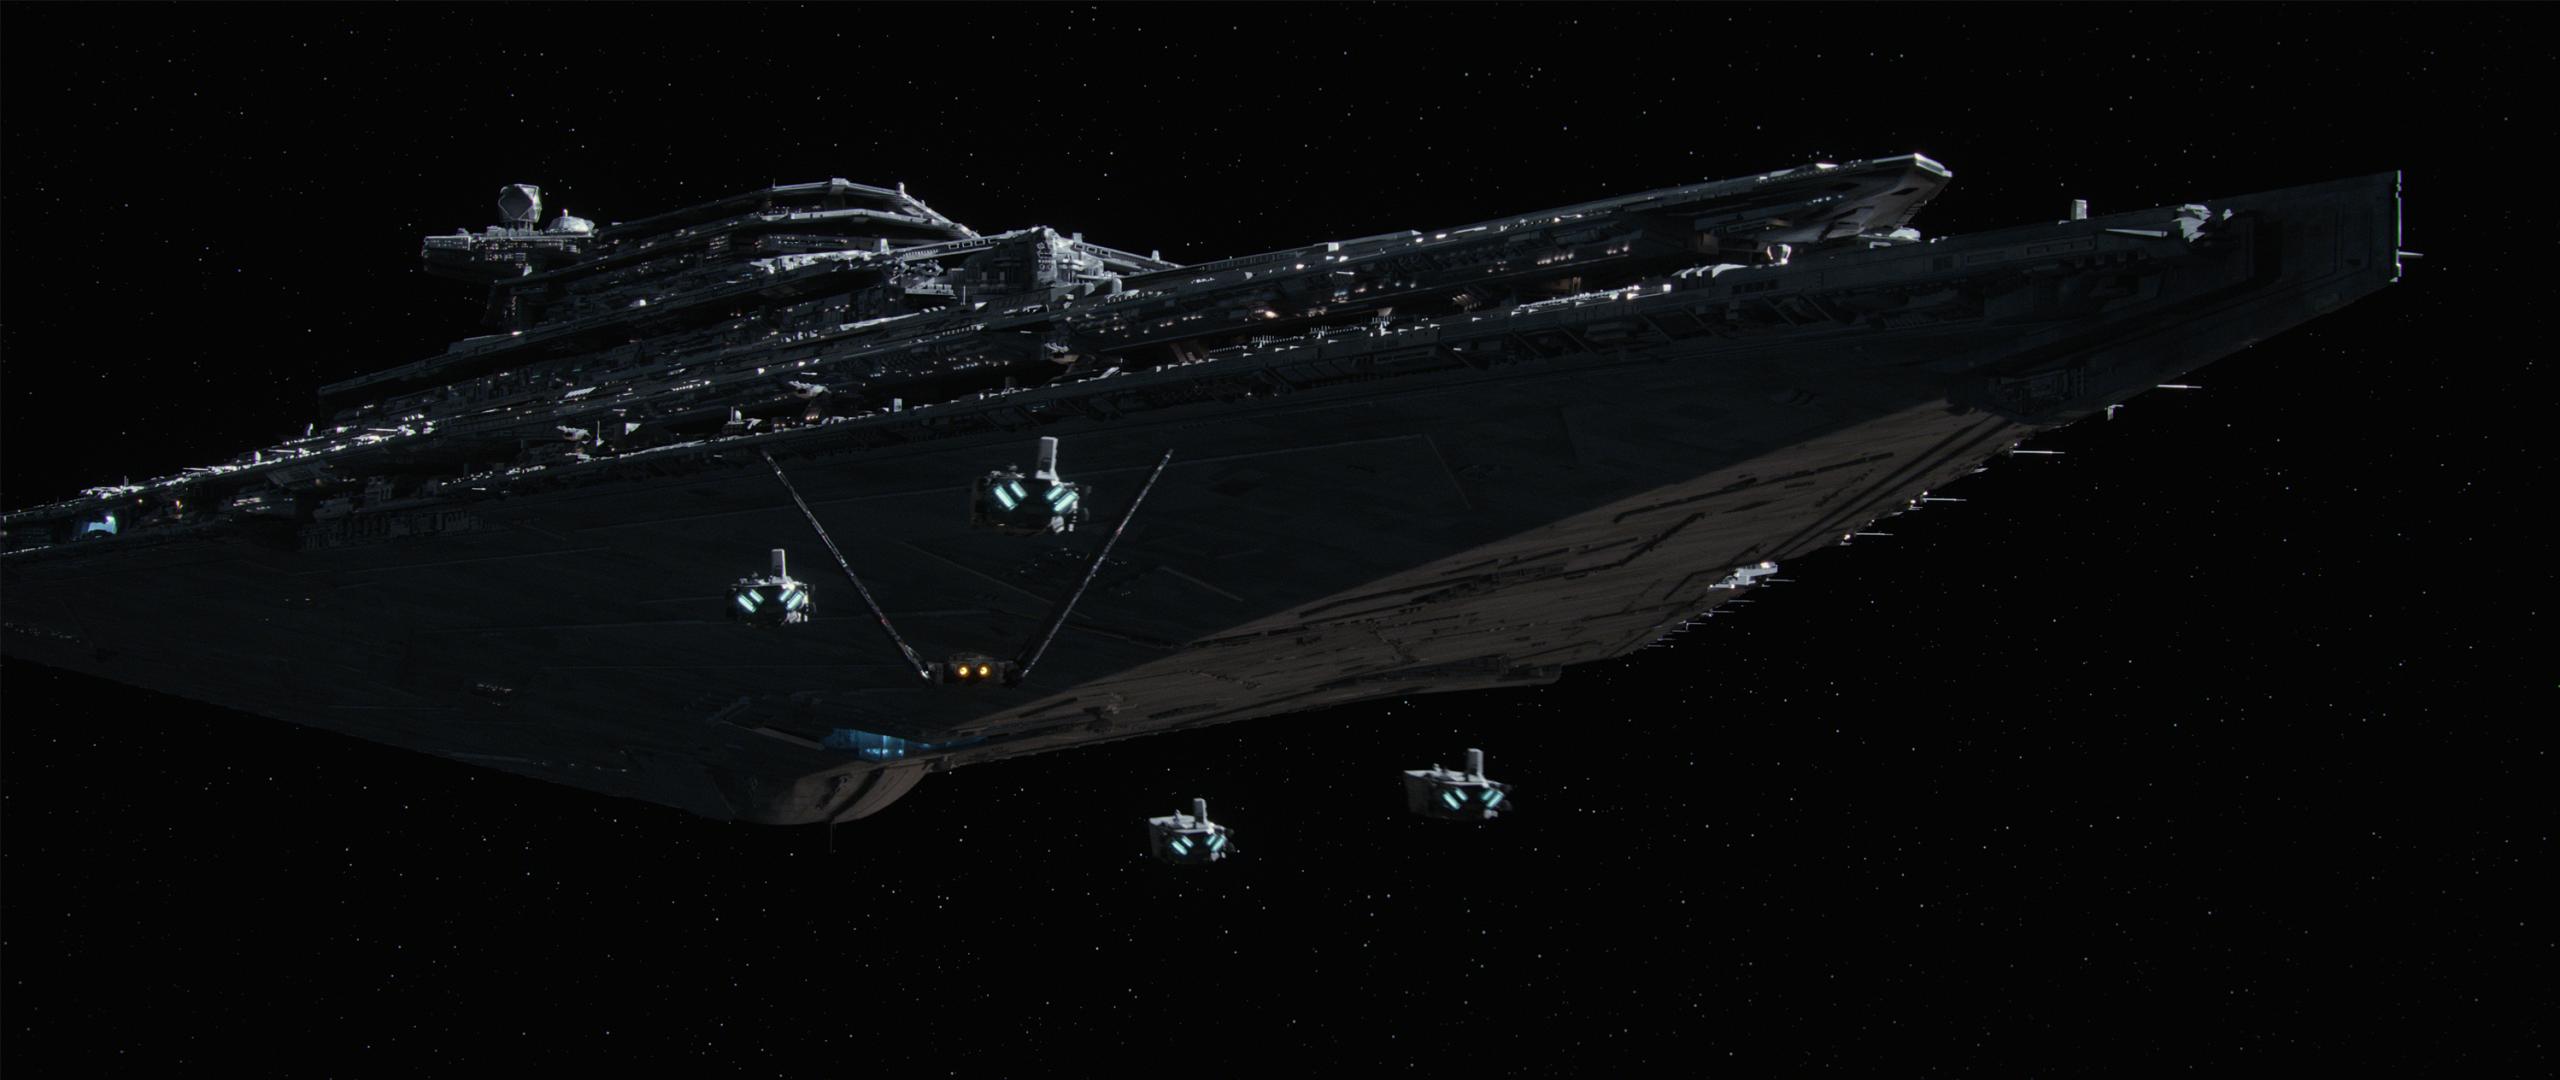 Star Wars Episode VII   The Force Awakens [Wallpapers HD]   Taringa 2560x1080